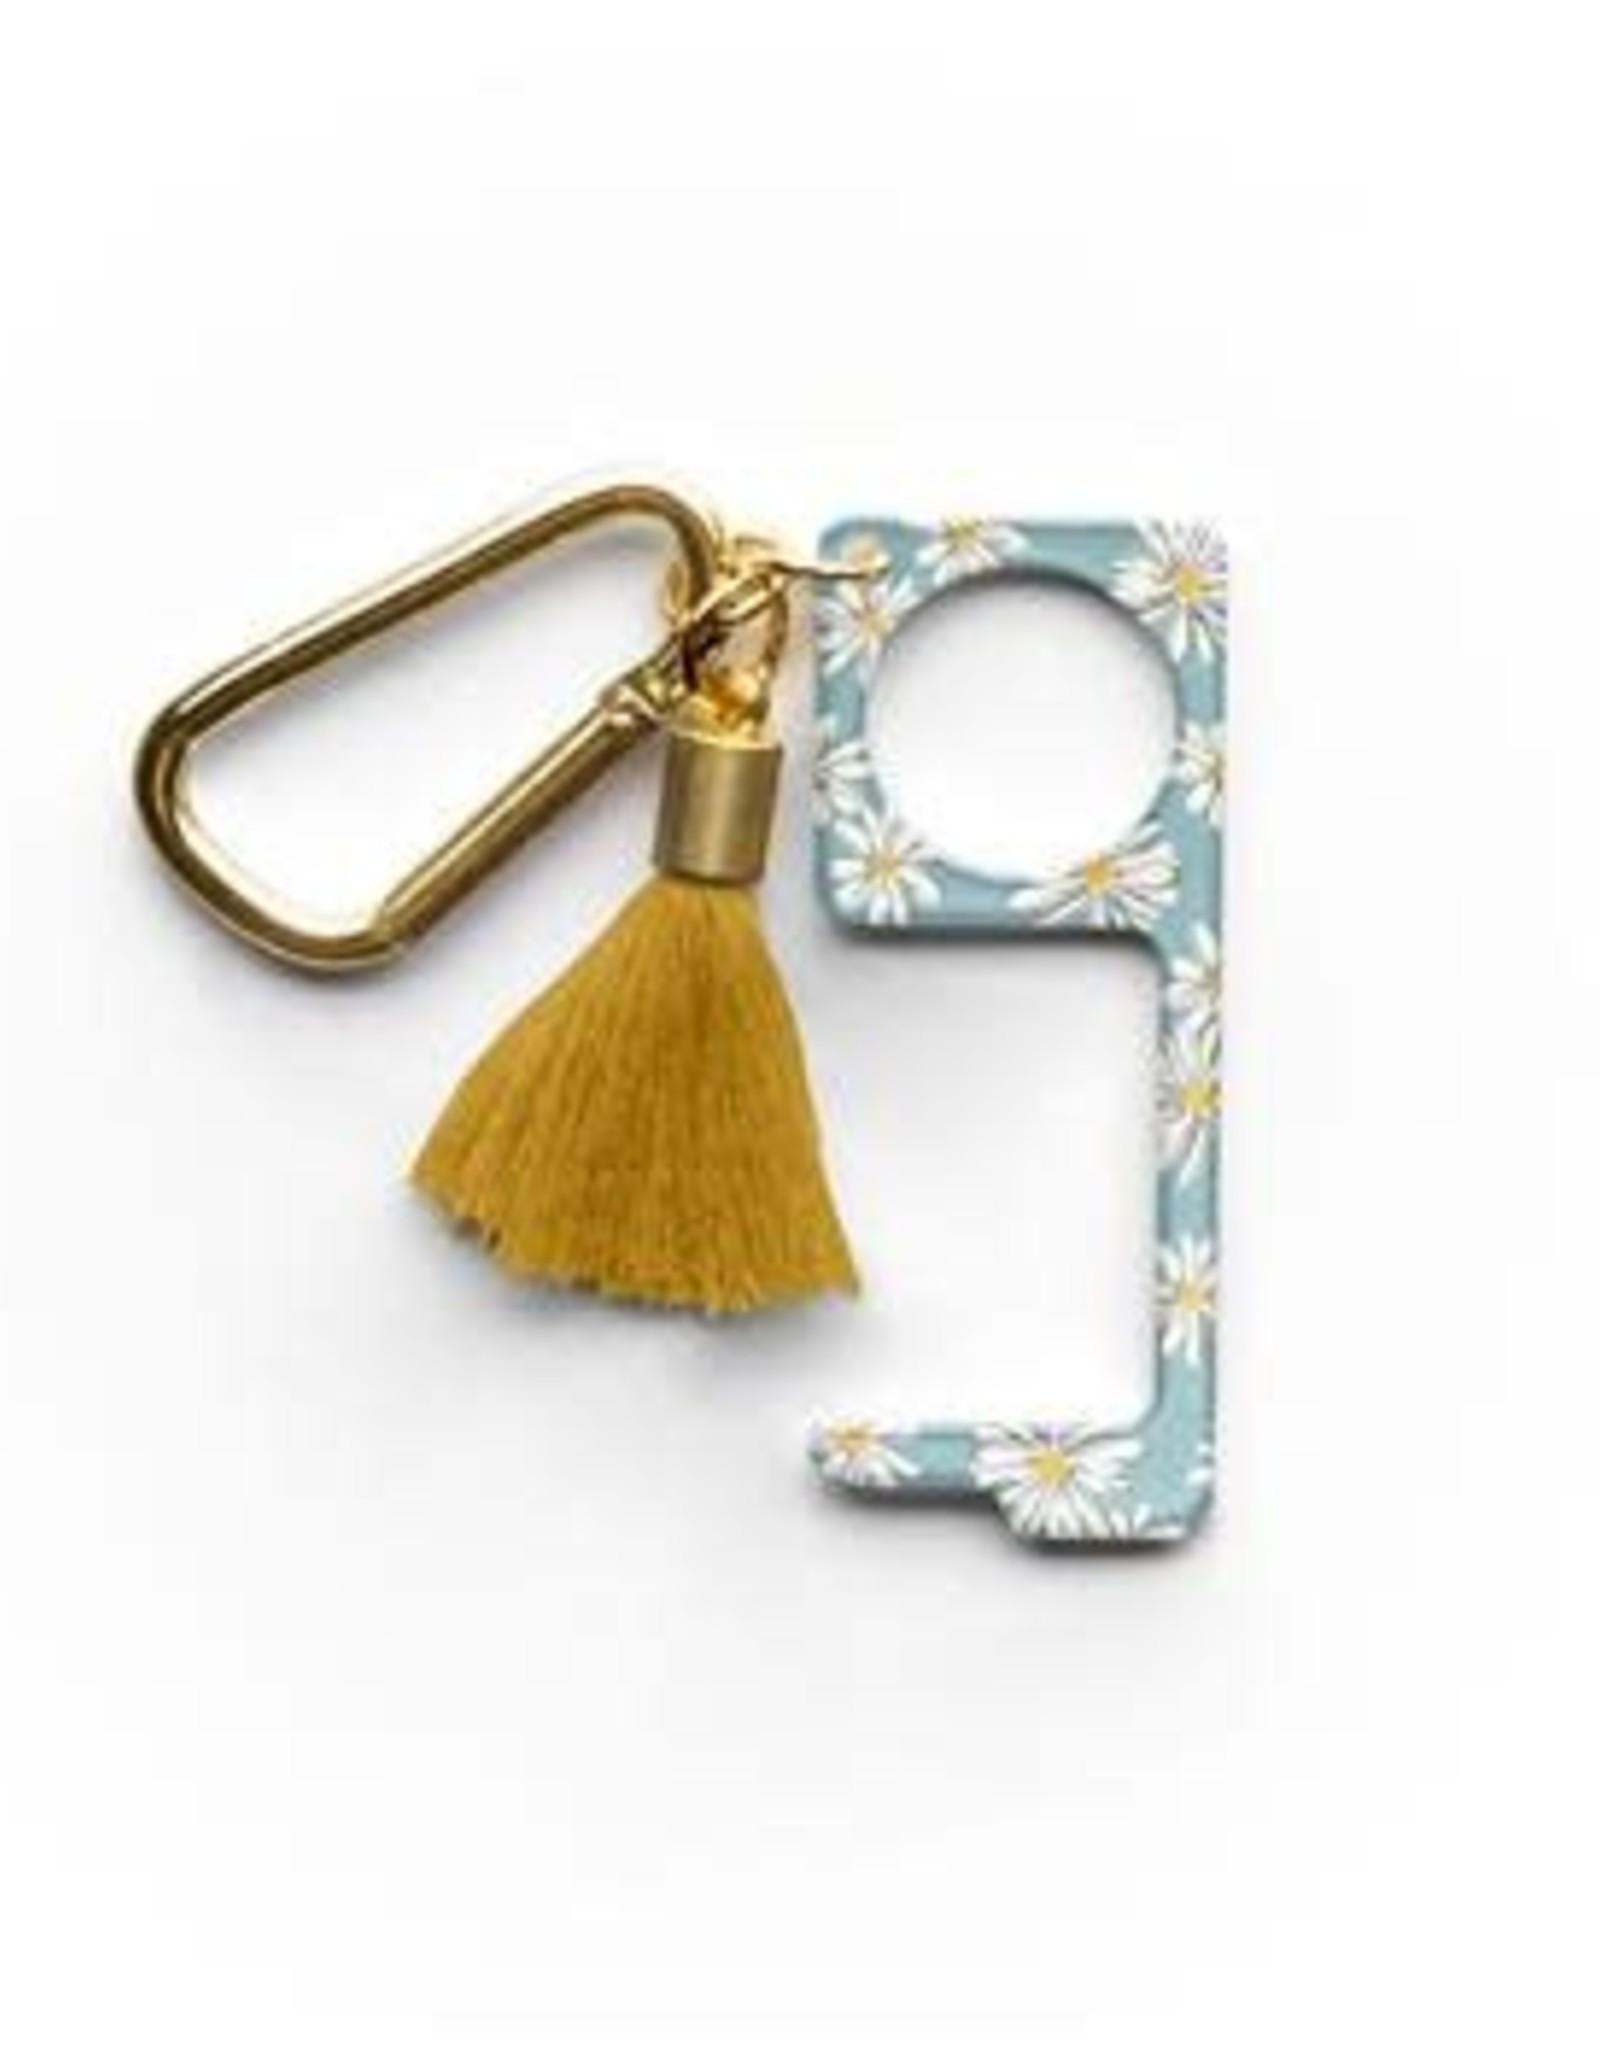 Karma Safe Touch Key Chain